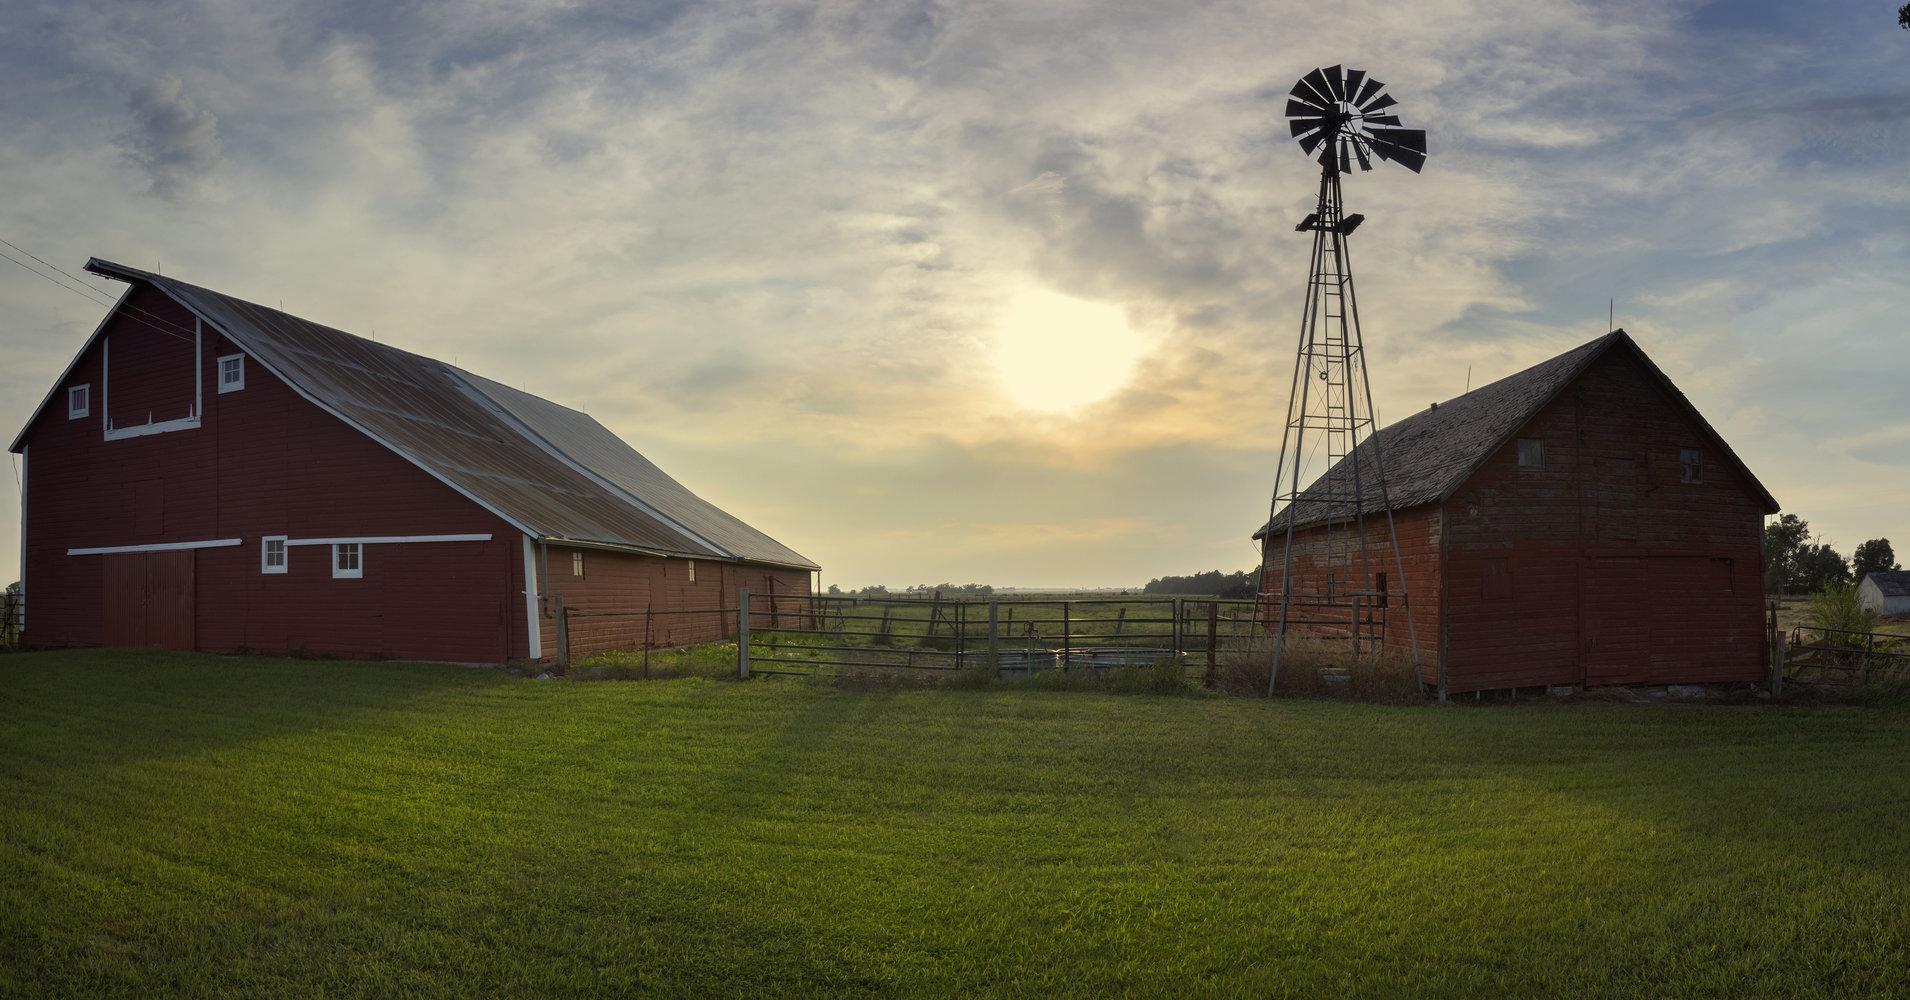 A barnyard with windmill set on the South Dakota plains at Sunset.